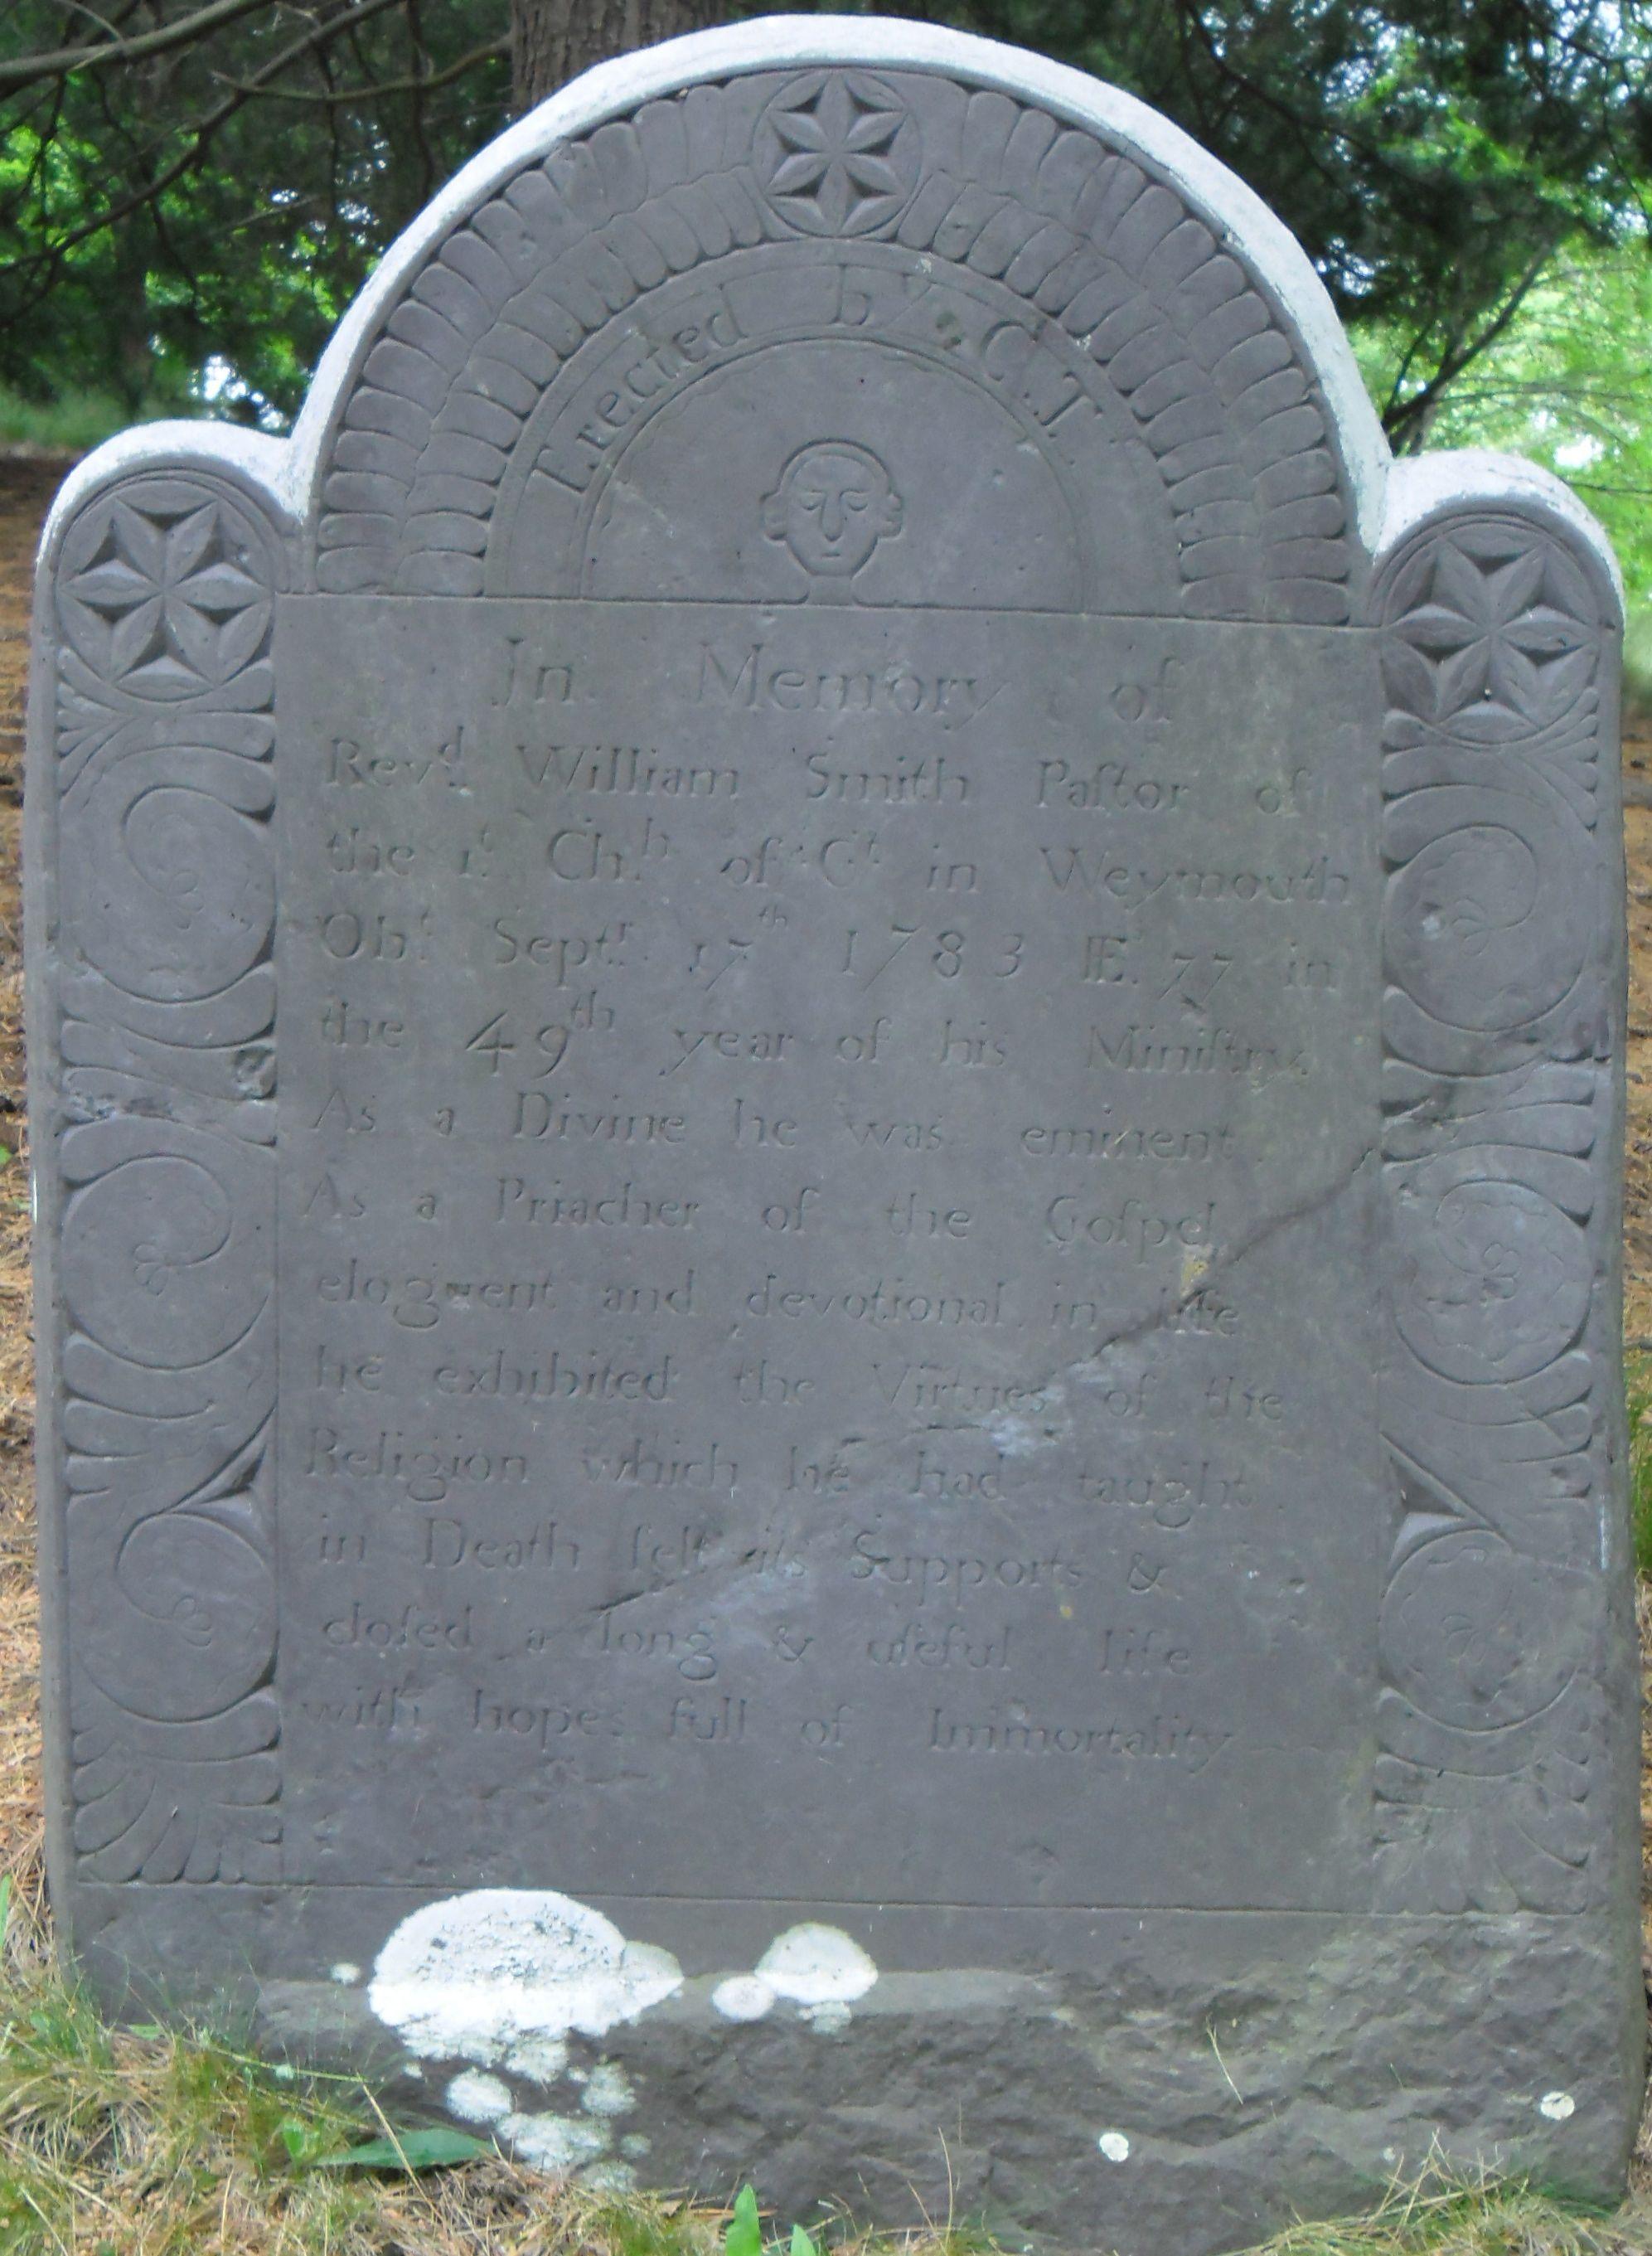 Rev William Smith, Jr